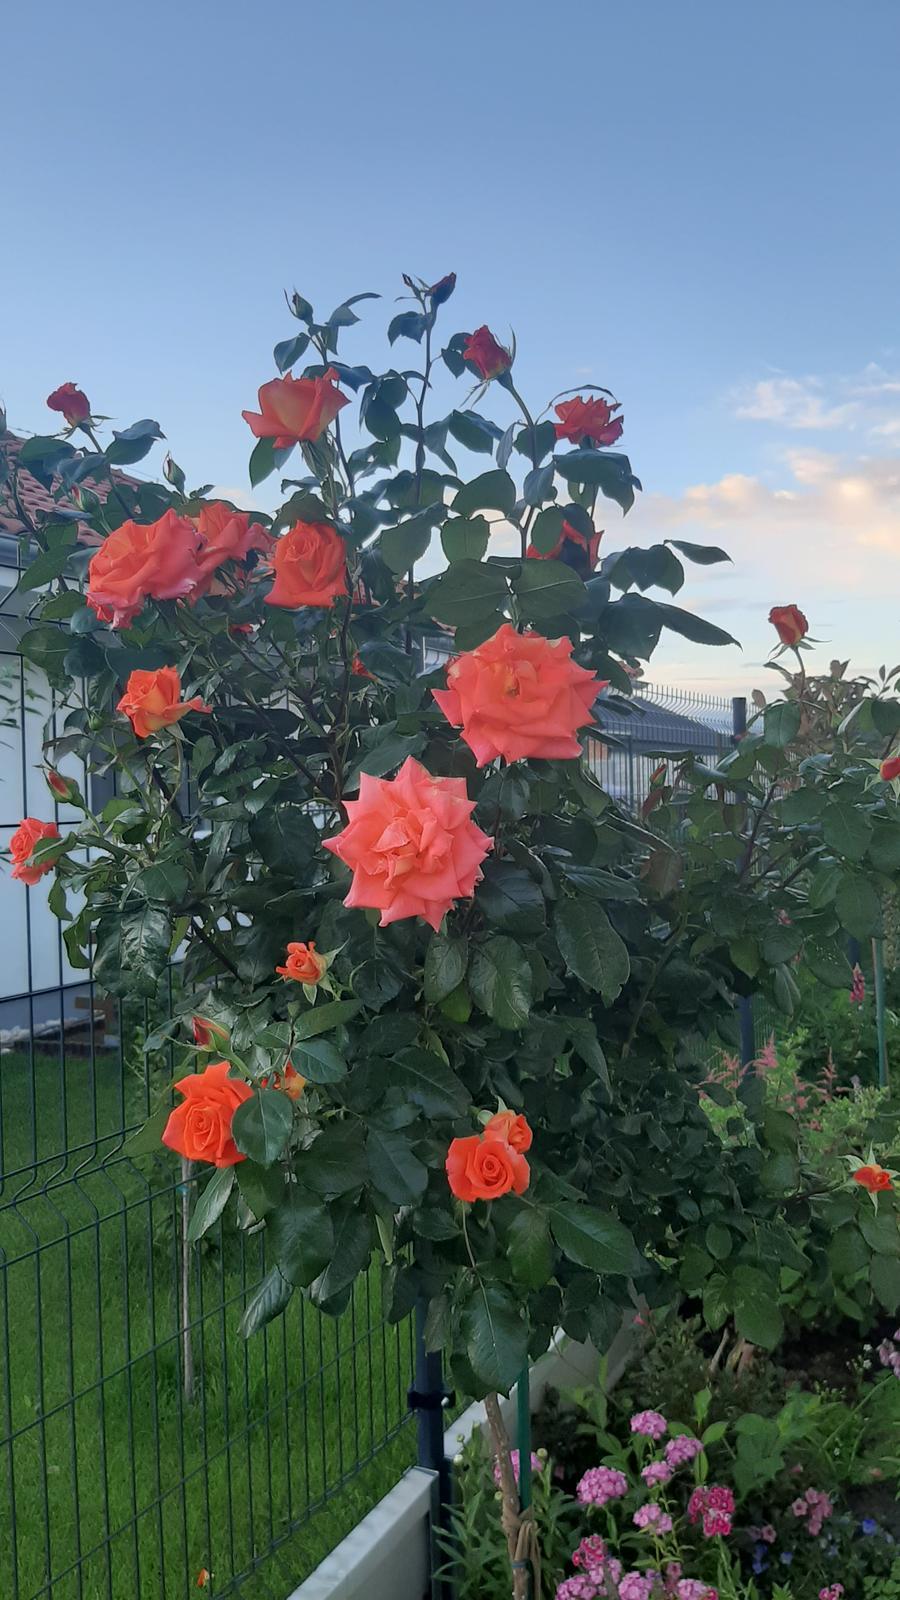 🏠🌞🌺❤🌷 Zahrada a jej dalsi rok...2020 🌱🐞🐛🦋🍓🥕🍅🌺❤ - Ruza kvitne jedna radost...